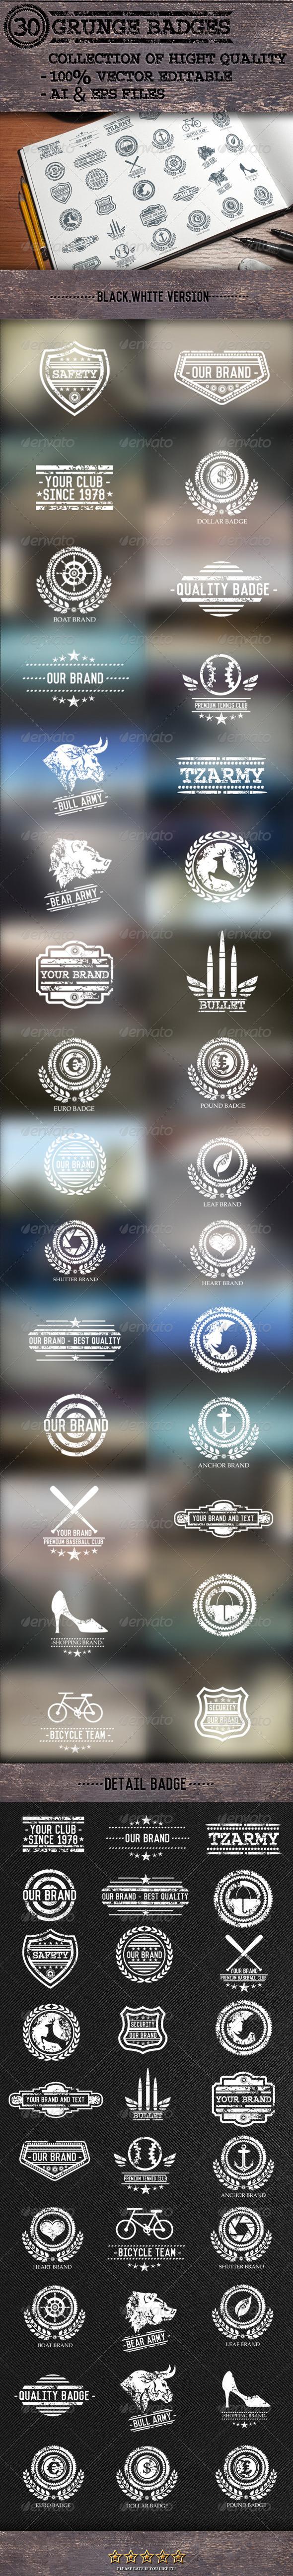 GraphicRiver 30 Grunge Badges 7762753